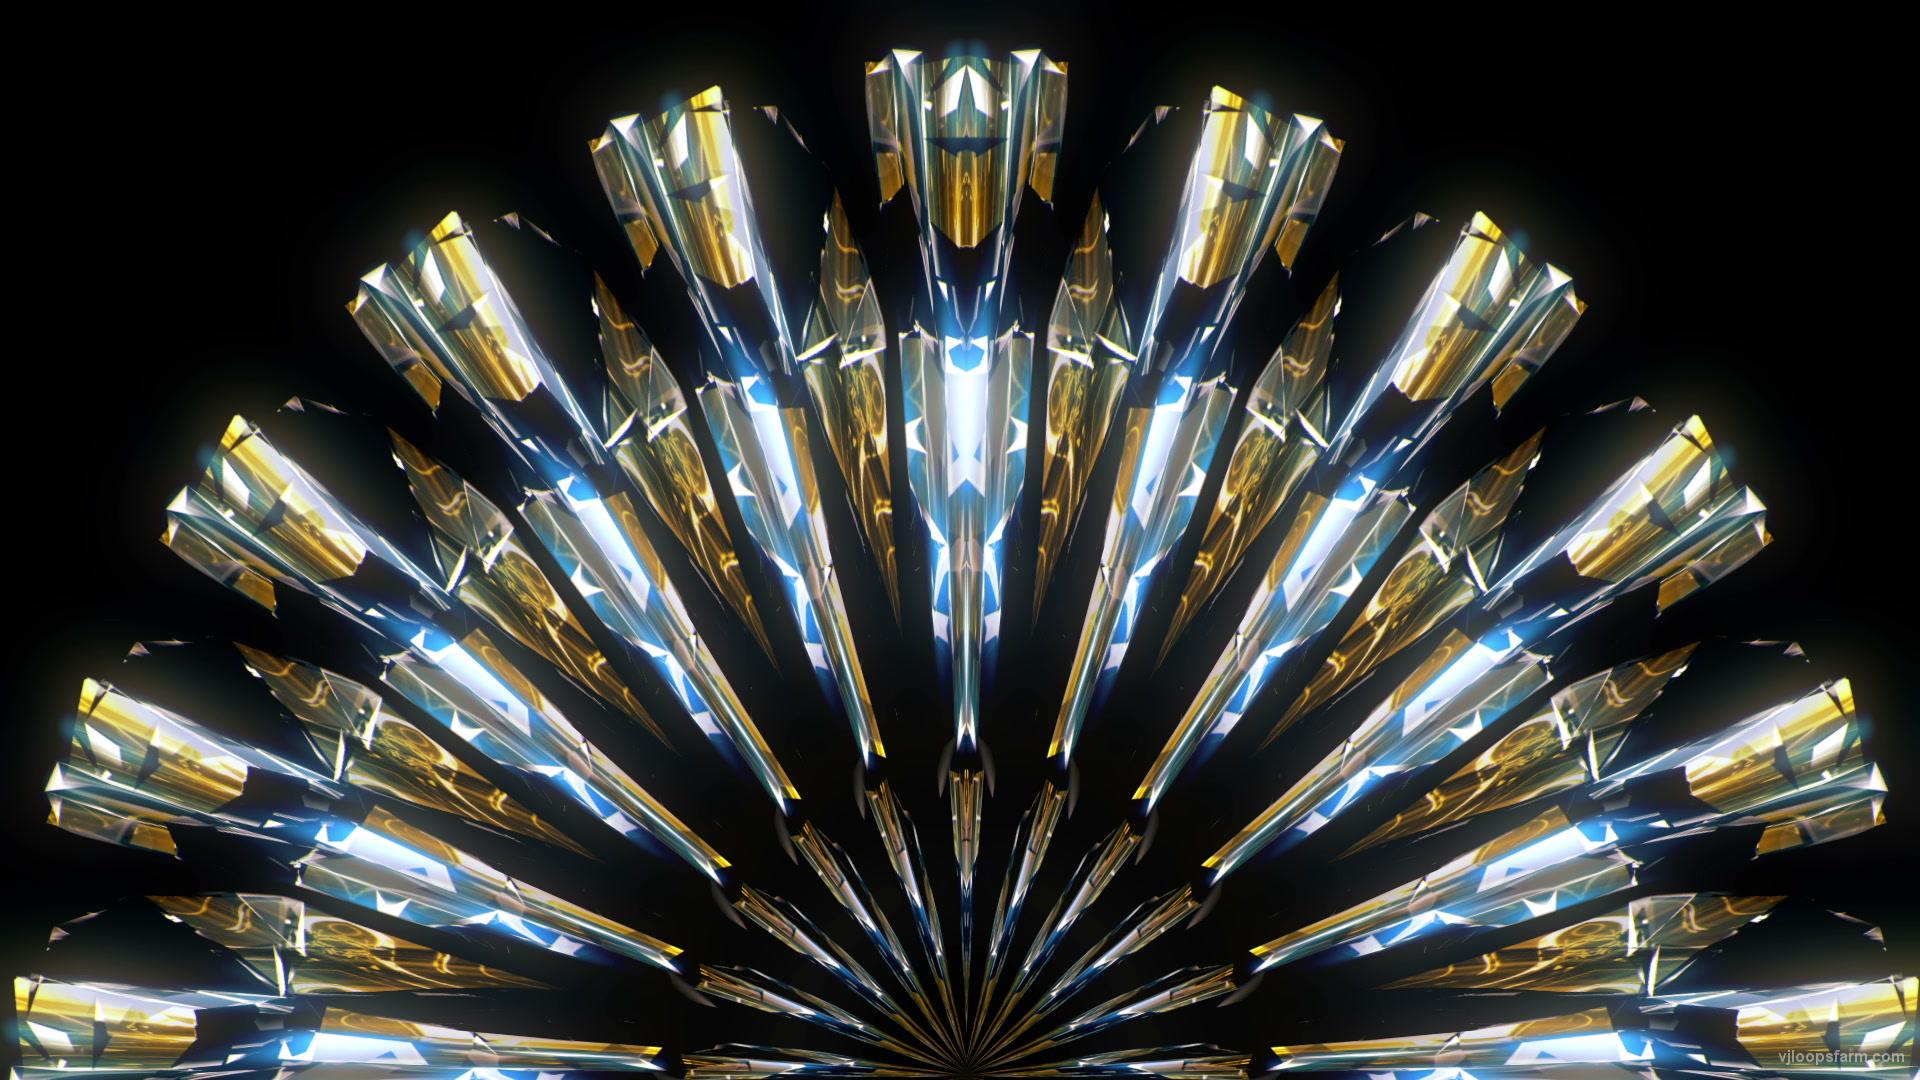 vj video background Light-Flower-ex_1920x1080_50fps_VJLoop_LIMEART_003